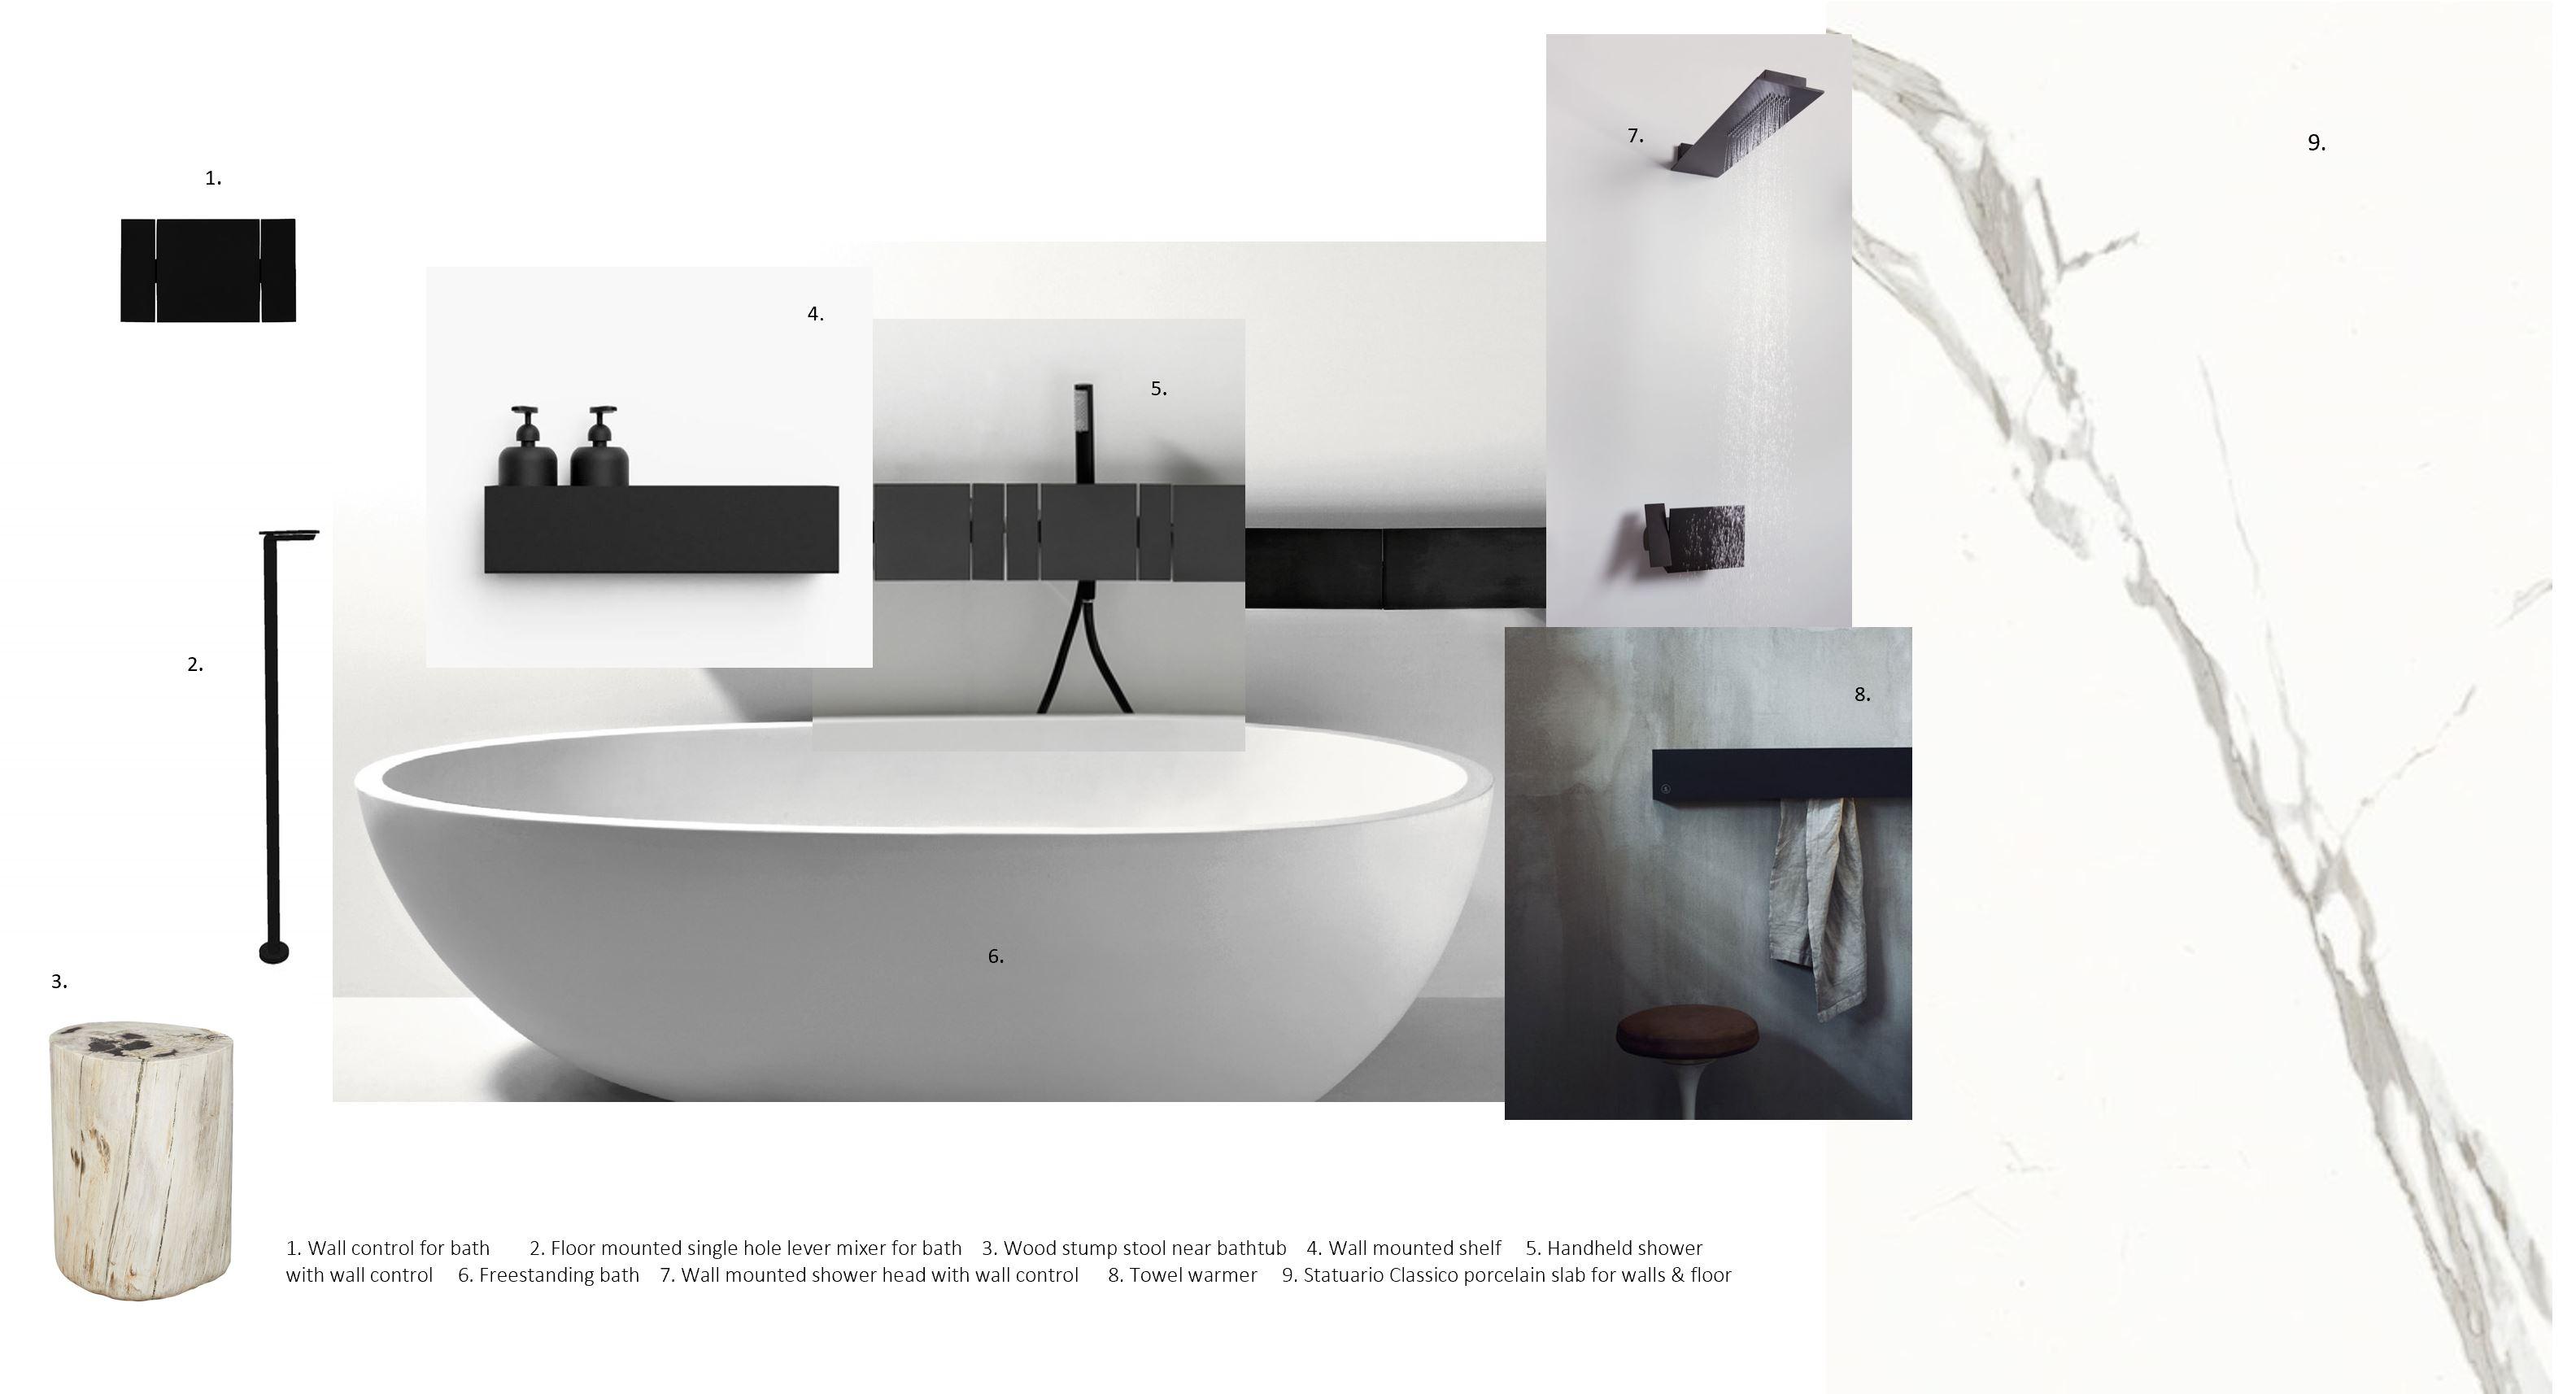 A photo of Triinu Oll's design ideals for a bathroom